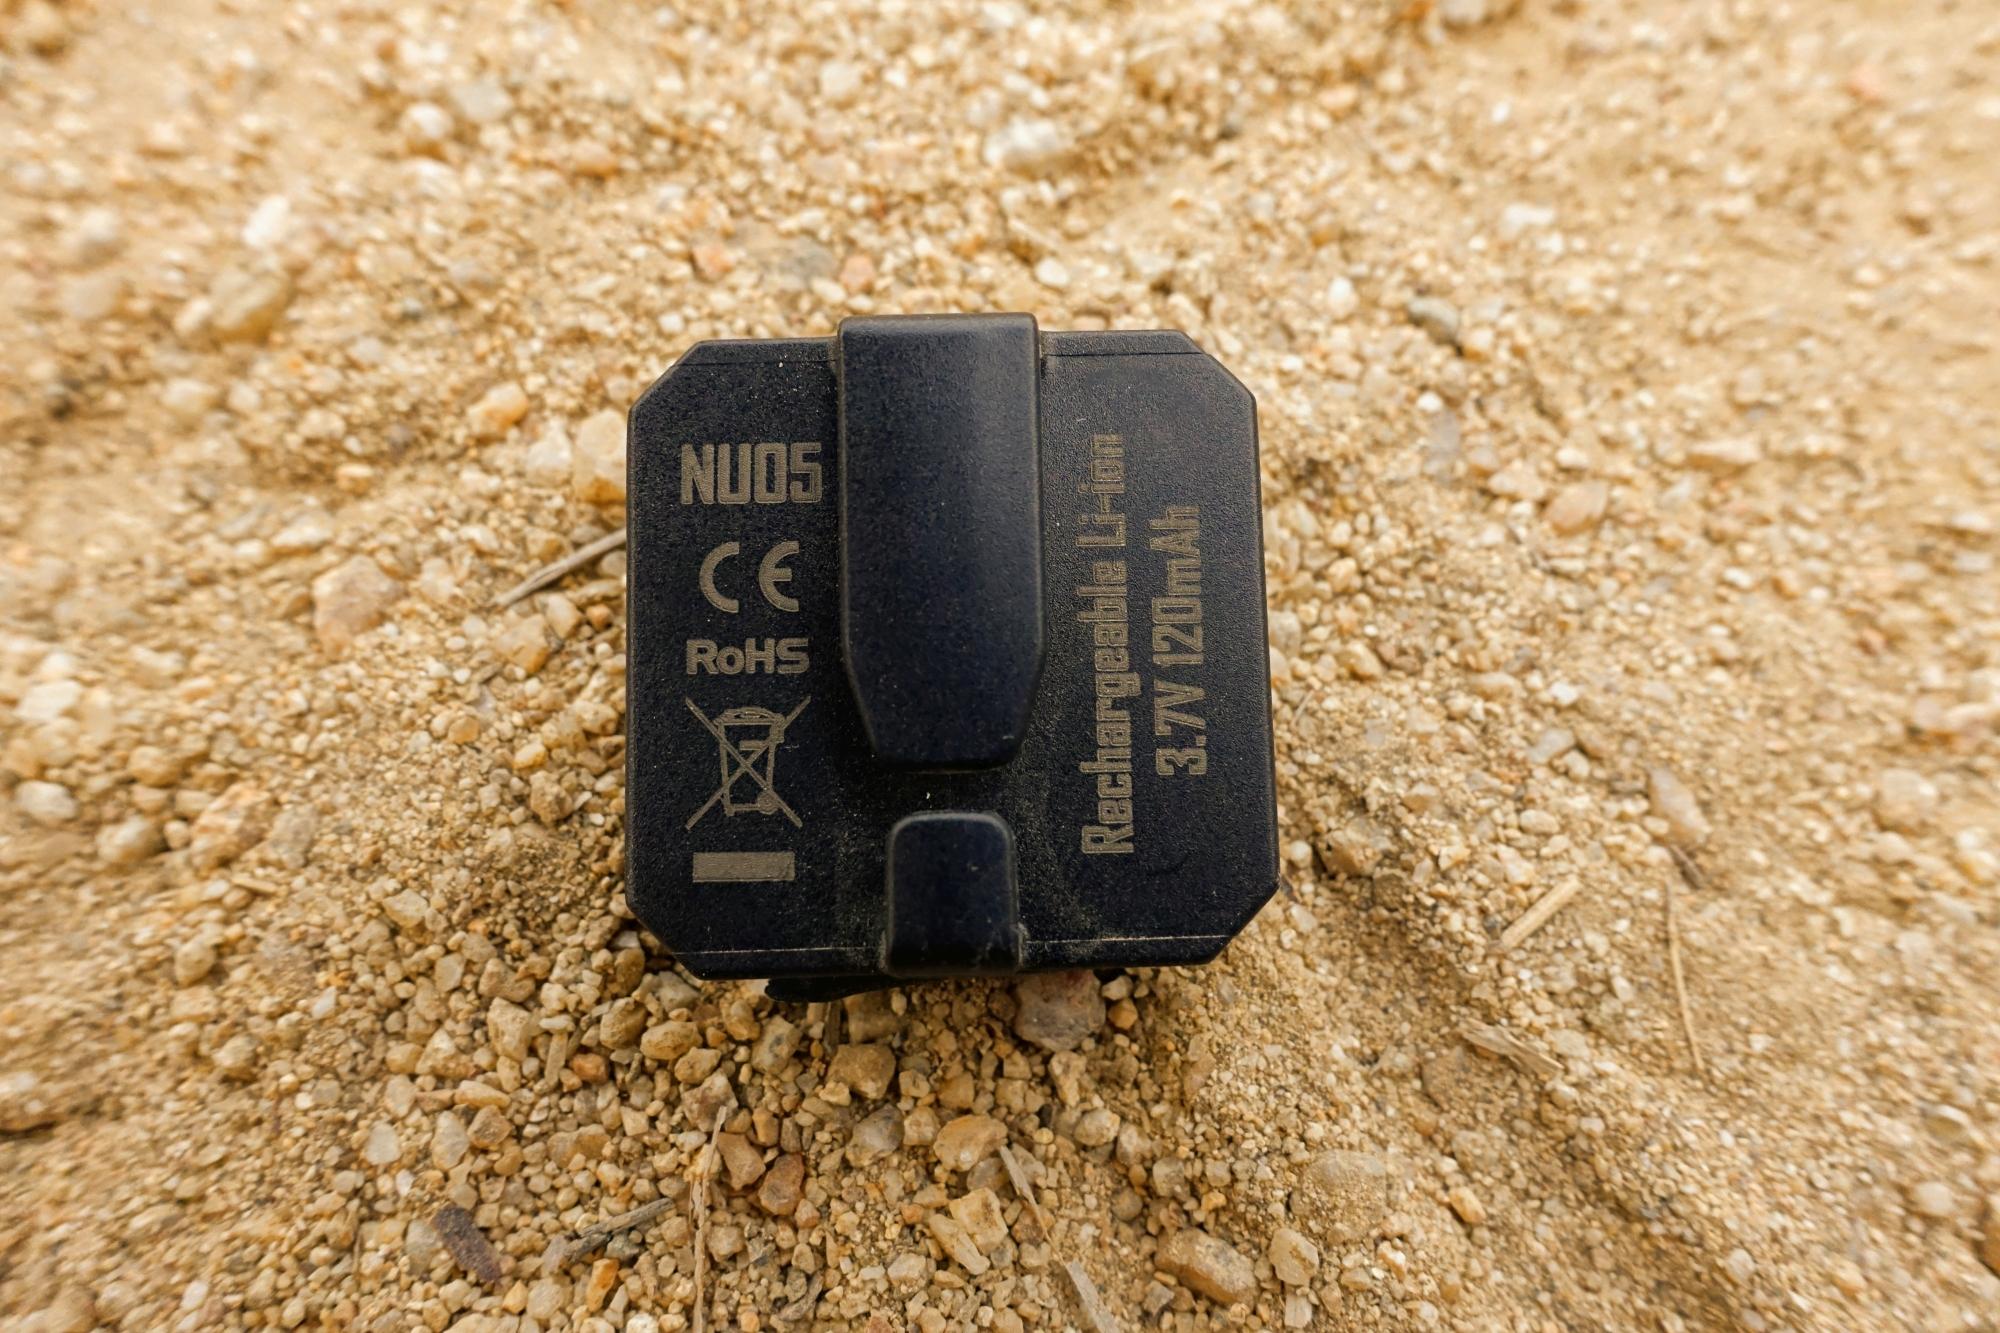 Nitecore NU05 Headlamp Review CivilGear 006 – CIVILGEAR ...